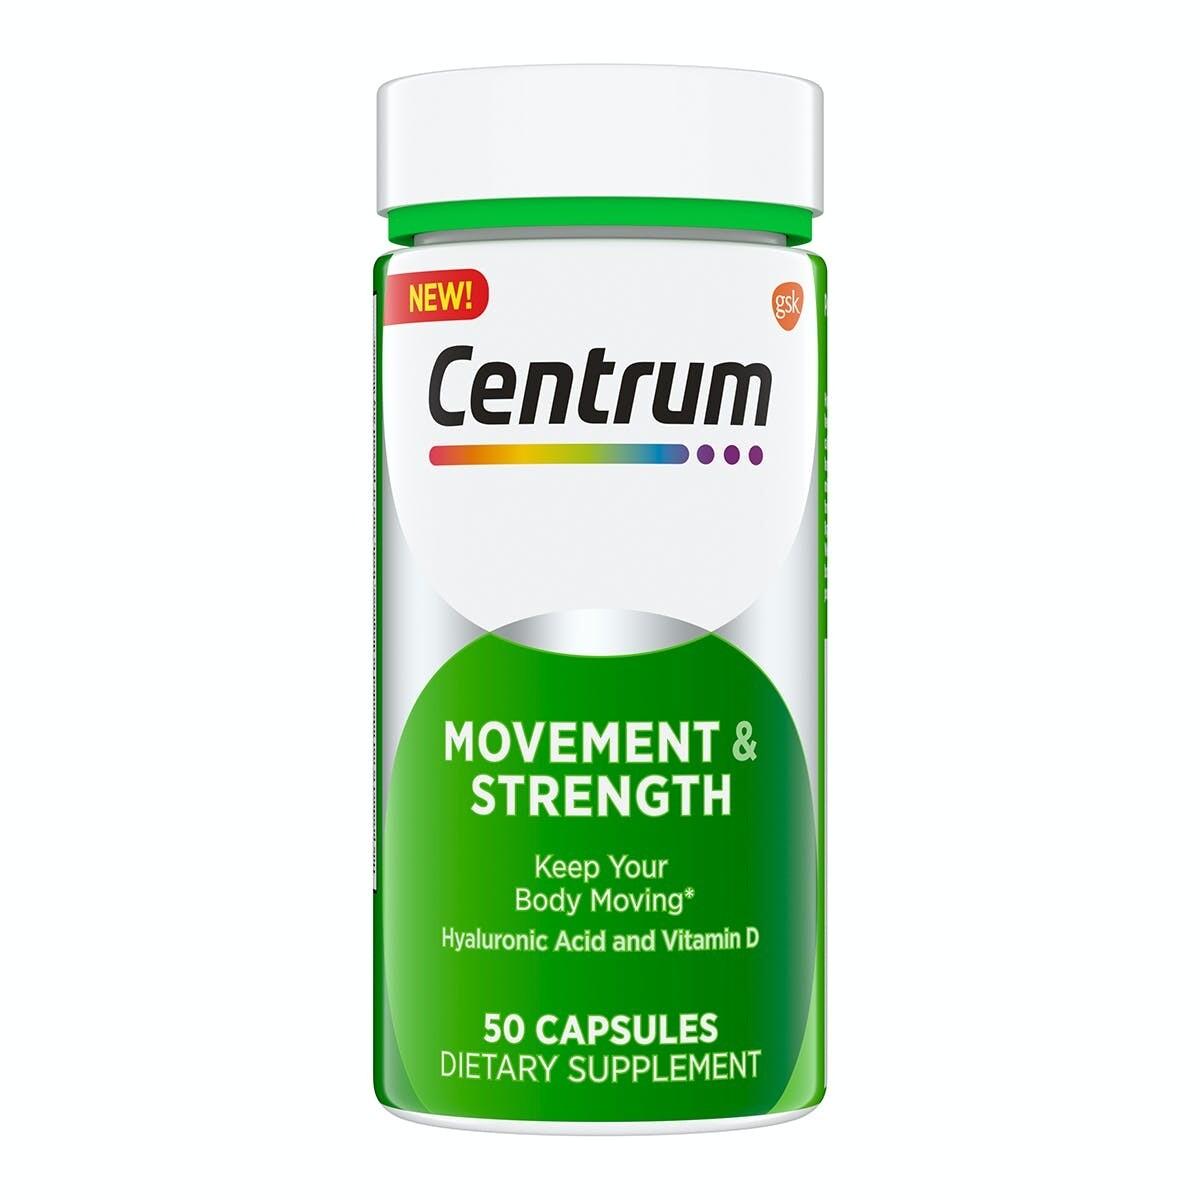 Centrum Movement & Strength